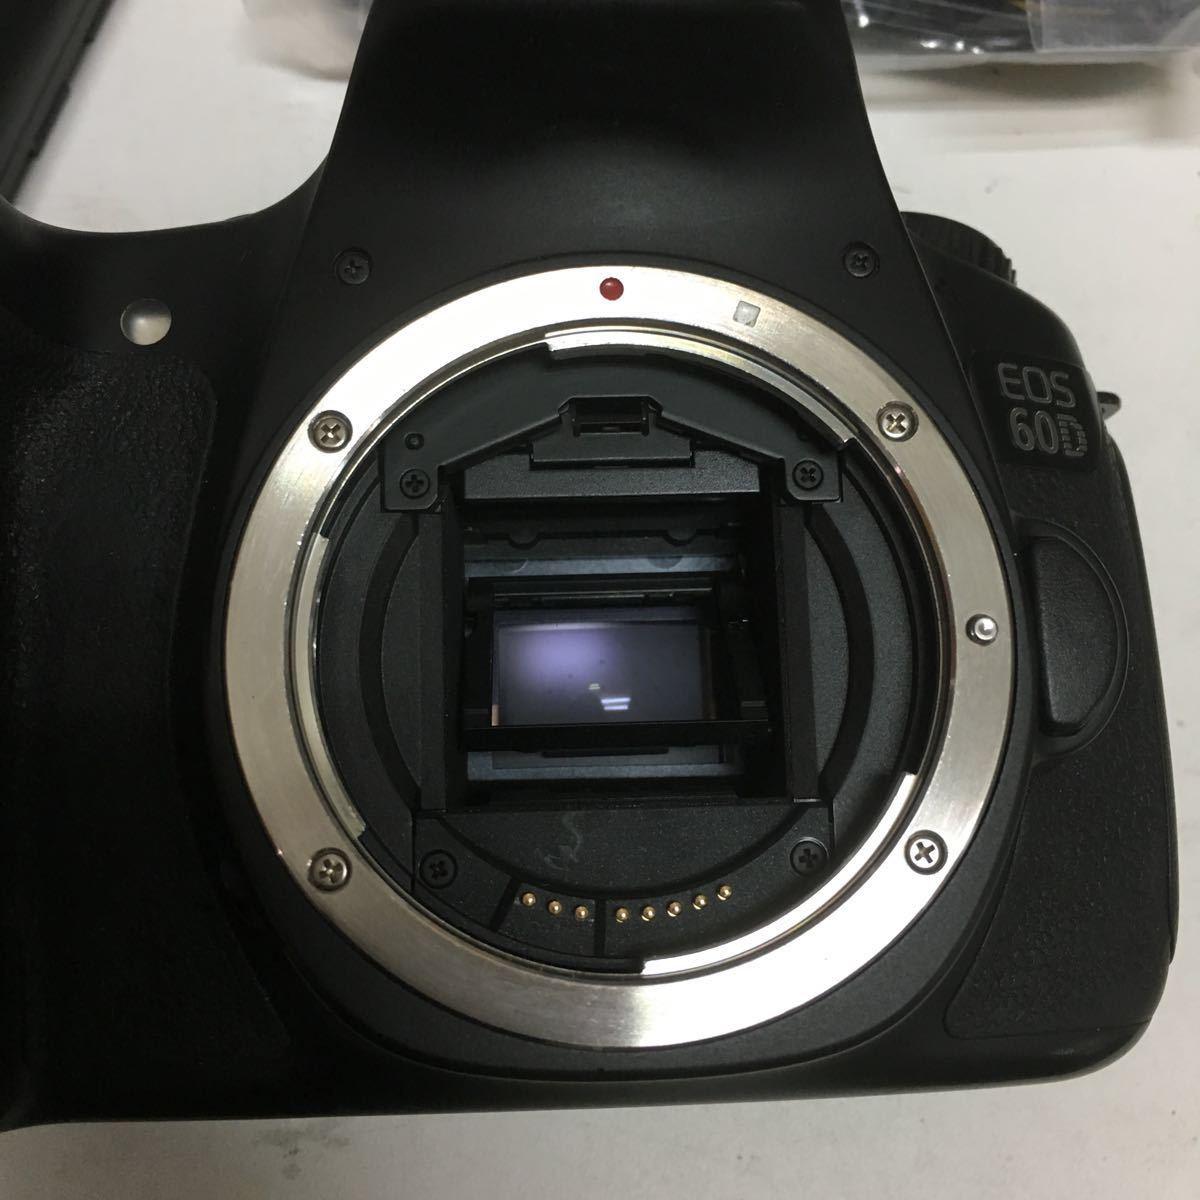 Canon デジタル一眼レフカメラ EOS 60D ボディ EOS60D_画像4